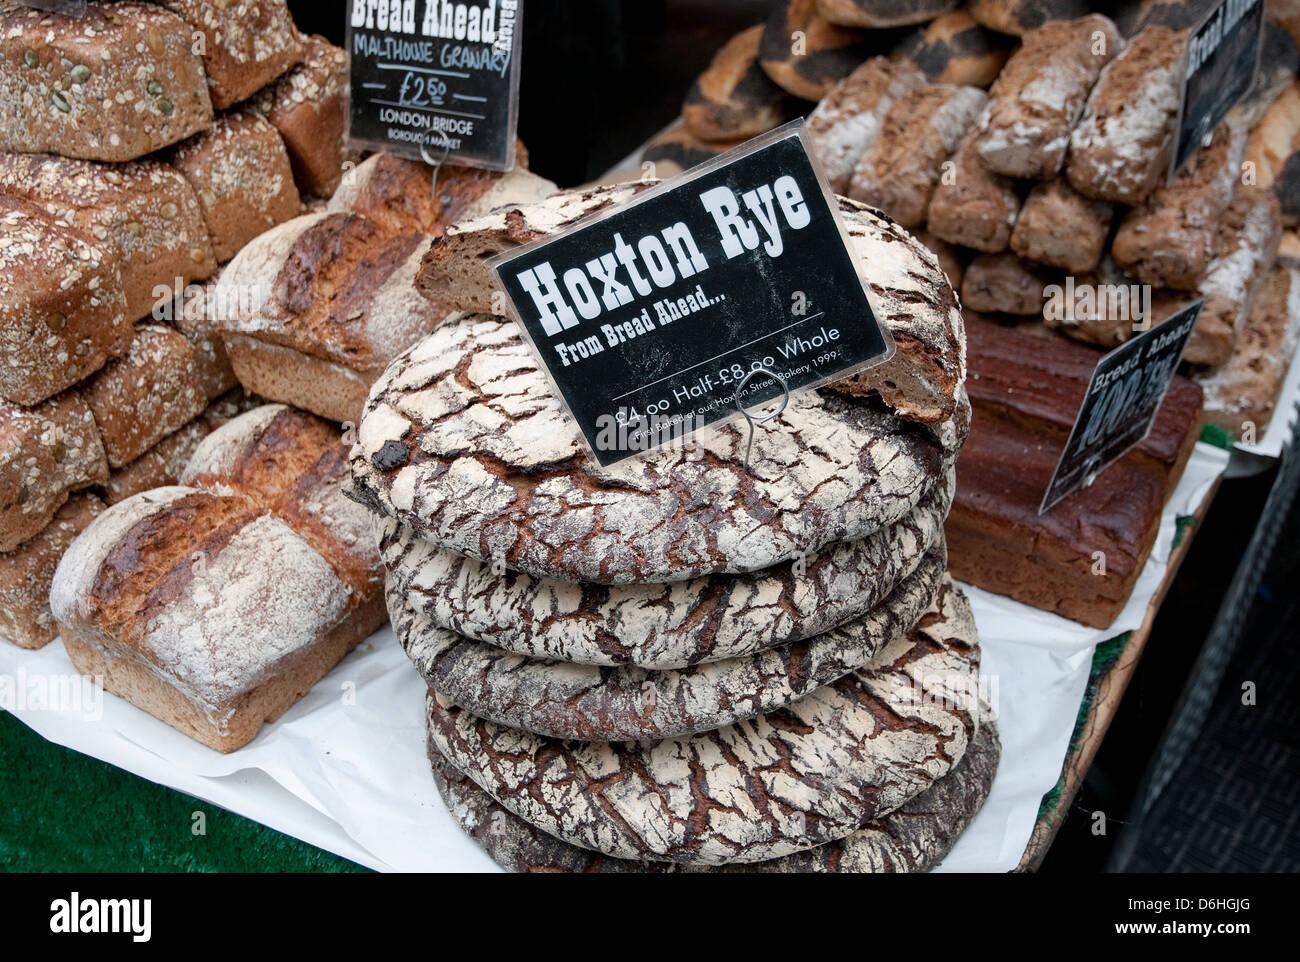 artisan bread, borough market, london, england - Stock Image